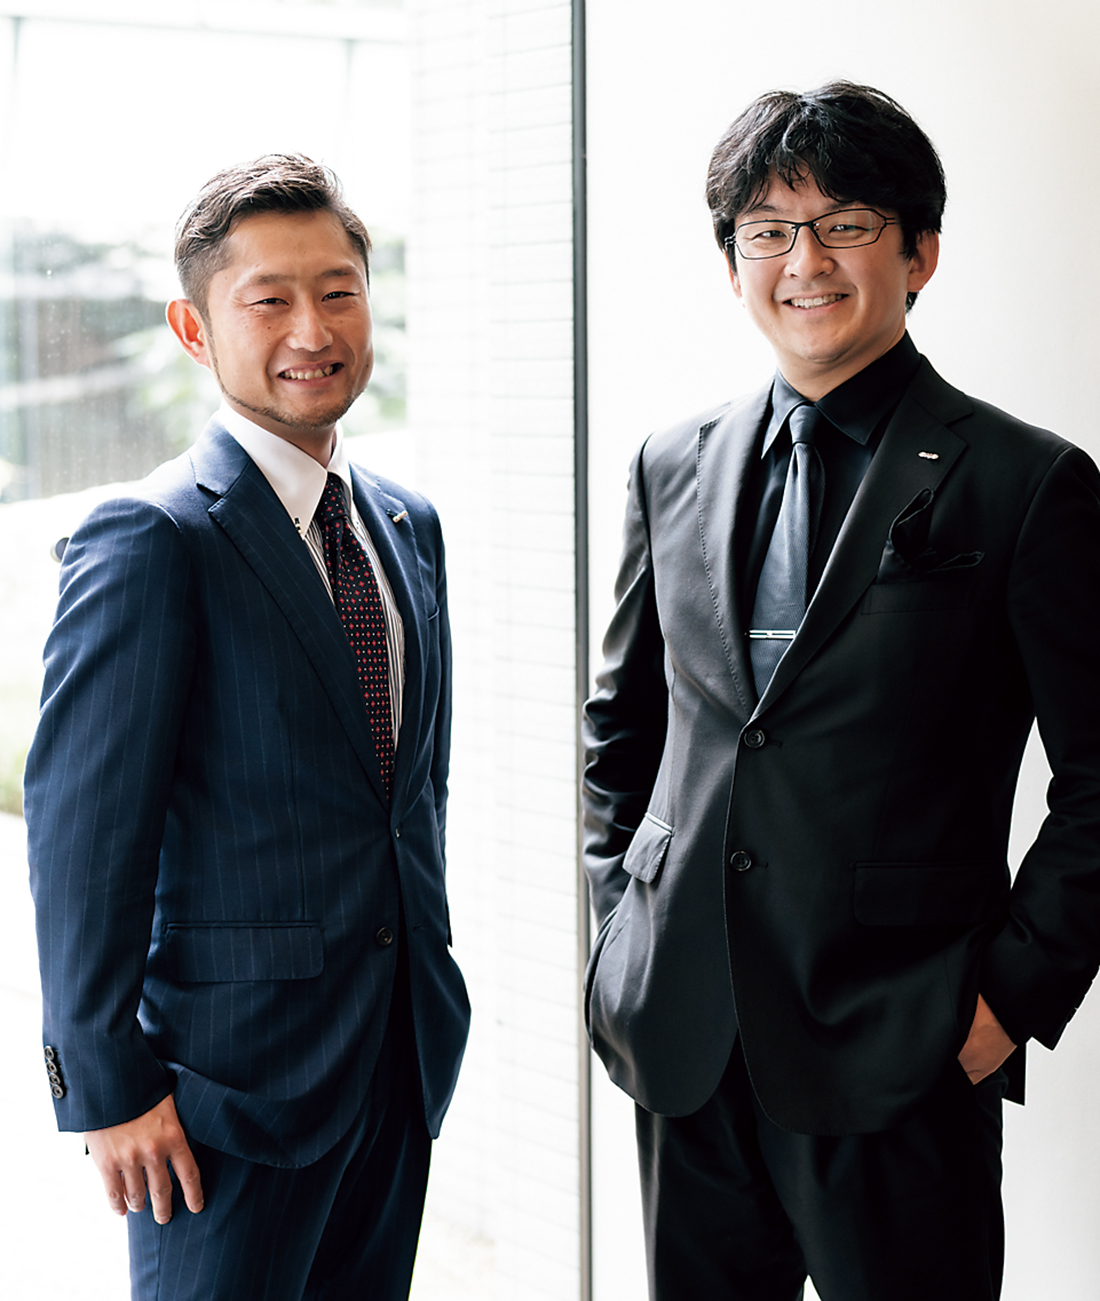 山中 真社長と営業担当の古井俊寛氏